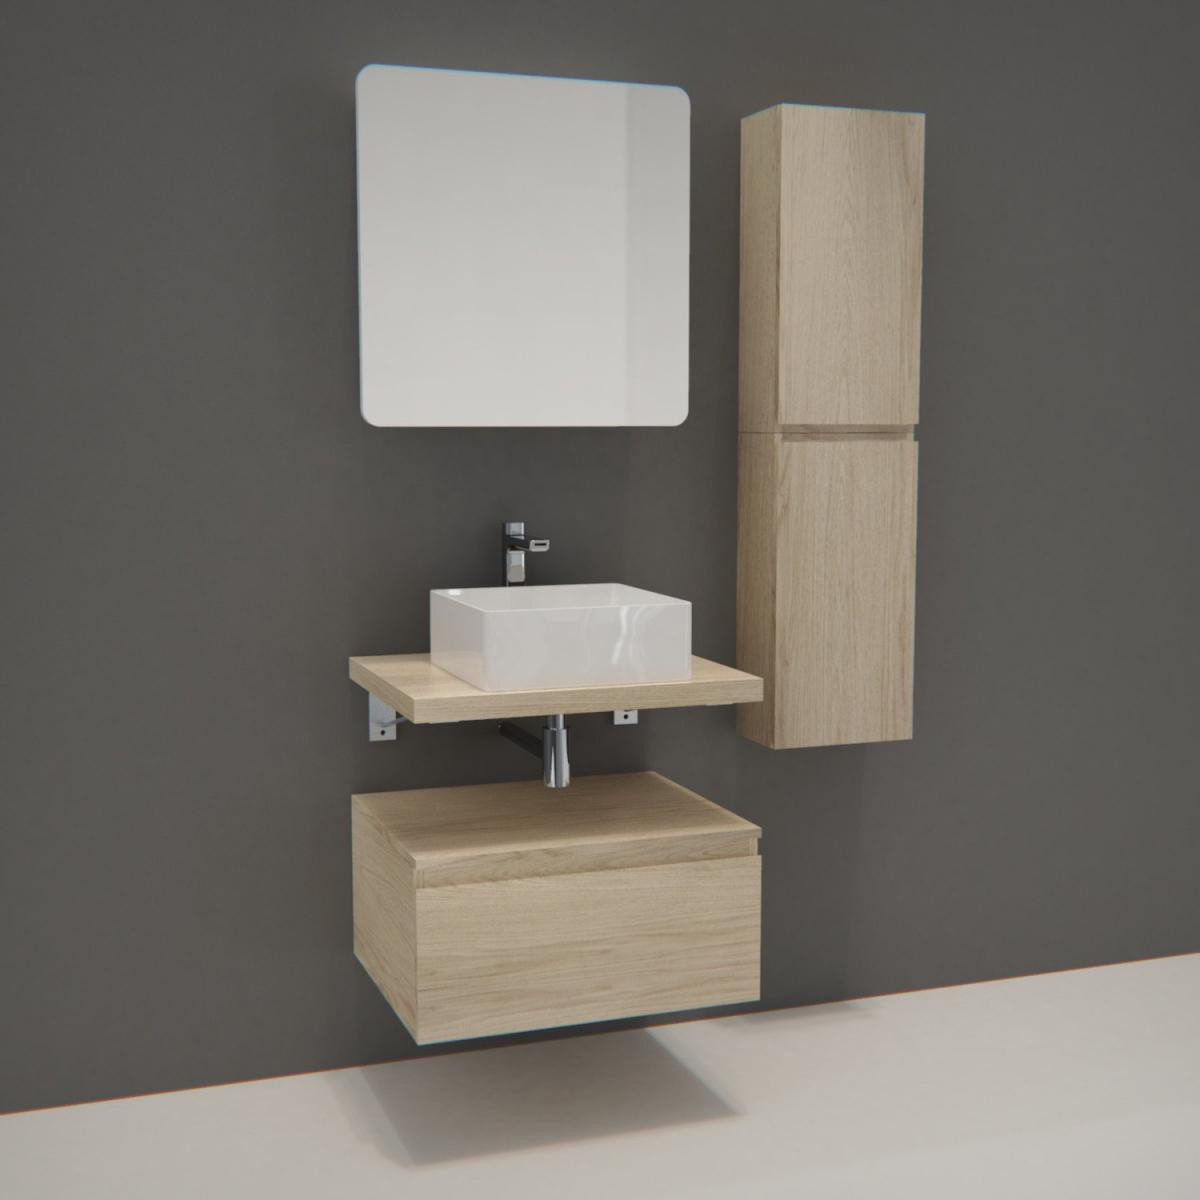 Mob-In Meuble de Salle de Bain WILL - Plan suspendu 60 cm + Vasque + Armoire de toilette + Equerres + Modules de rangement